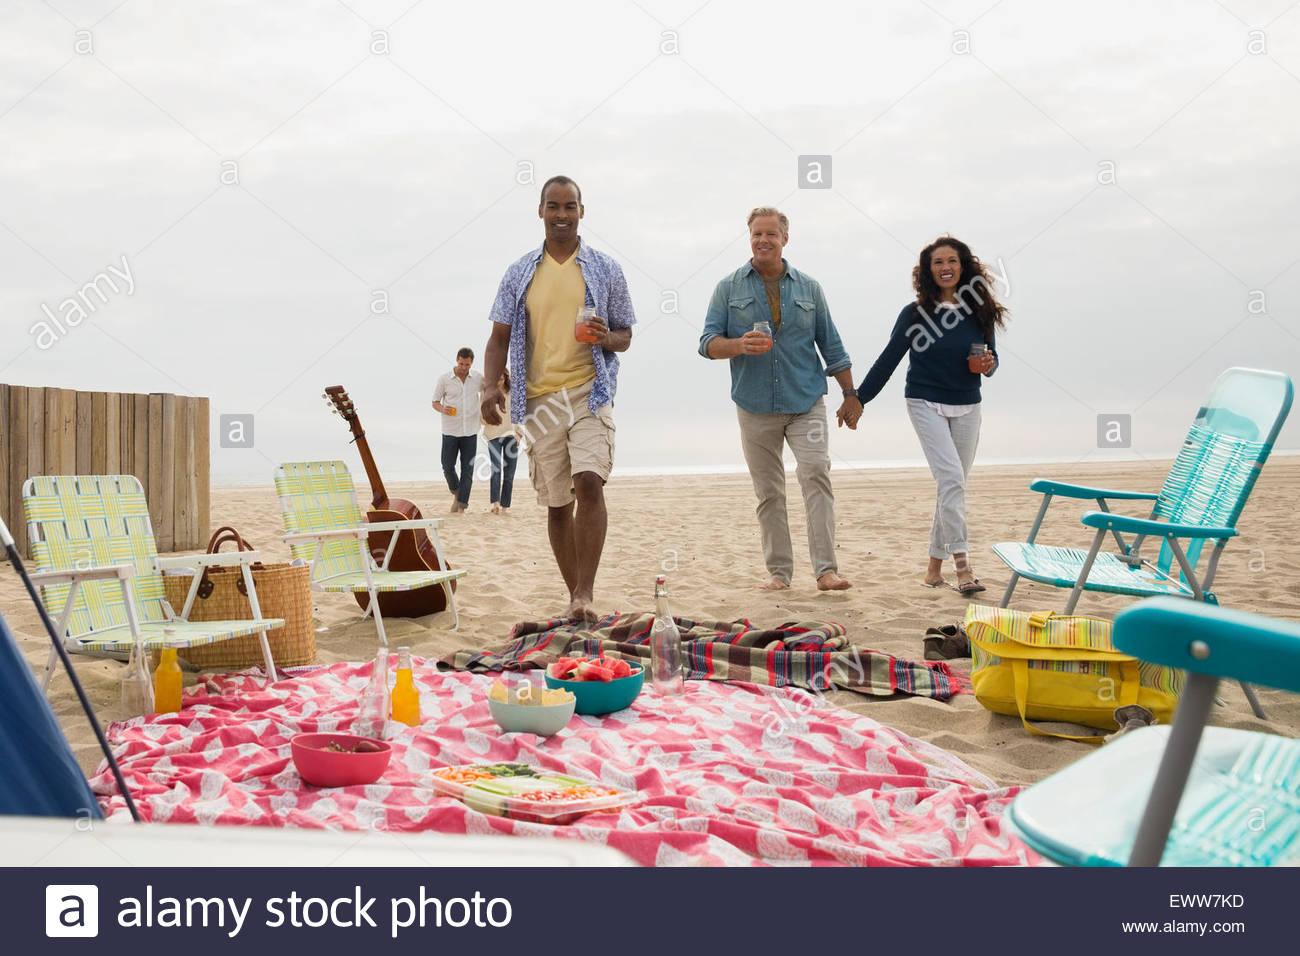 Friends walking toward beach picnic - Stock Image